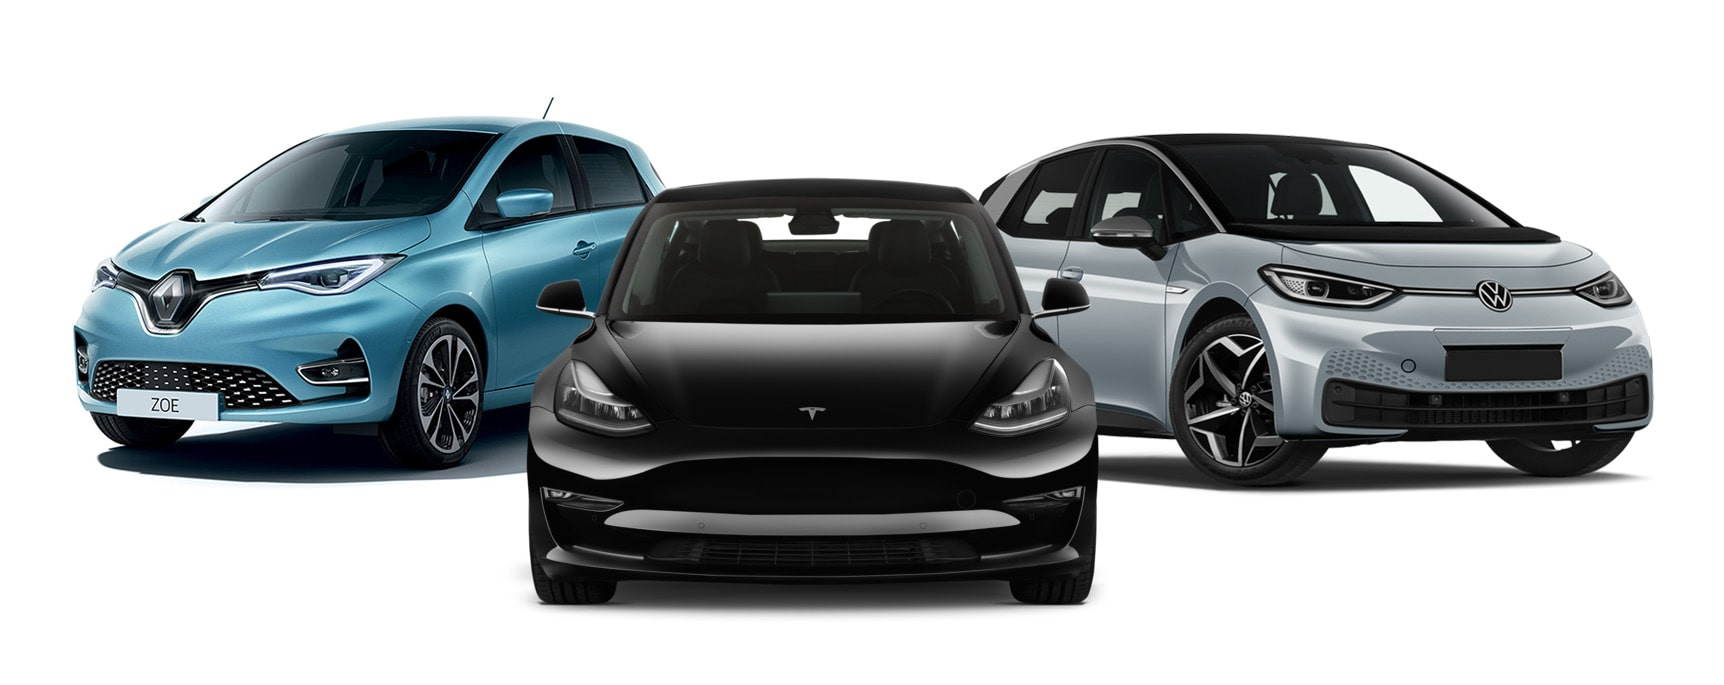 Ventas de coches eléctricos abril 2021